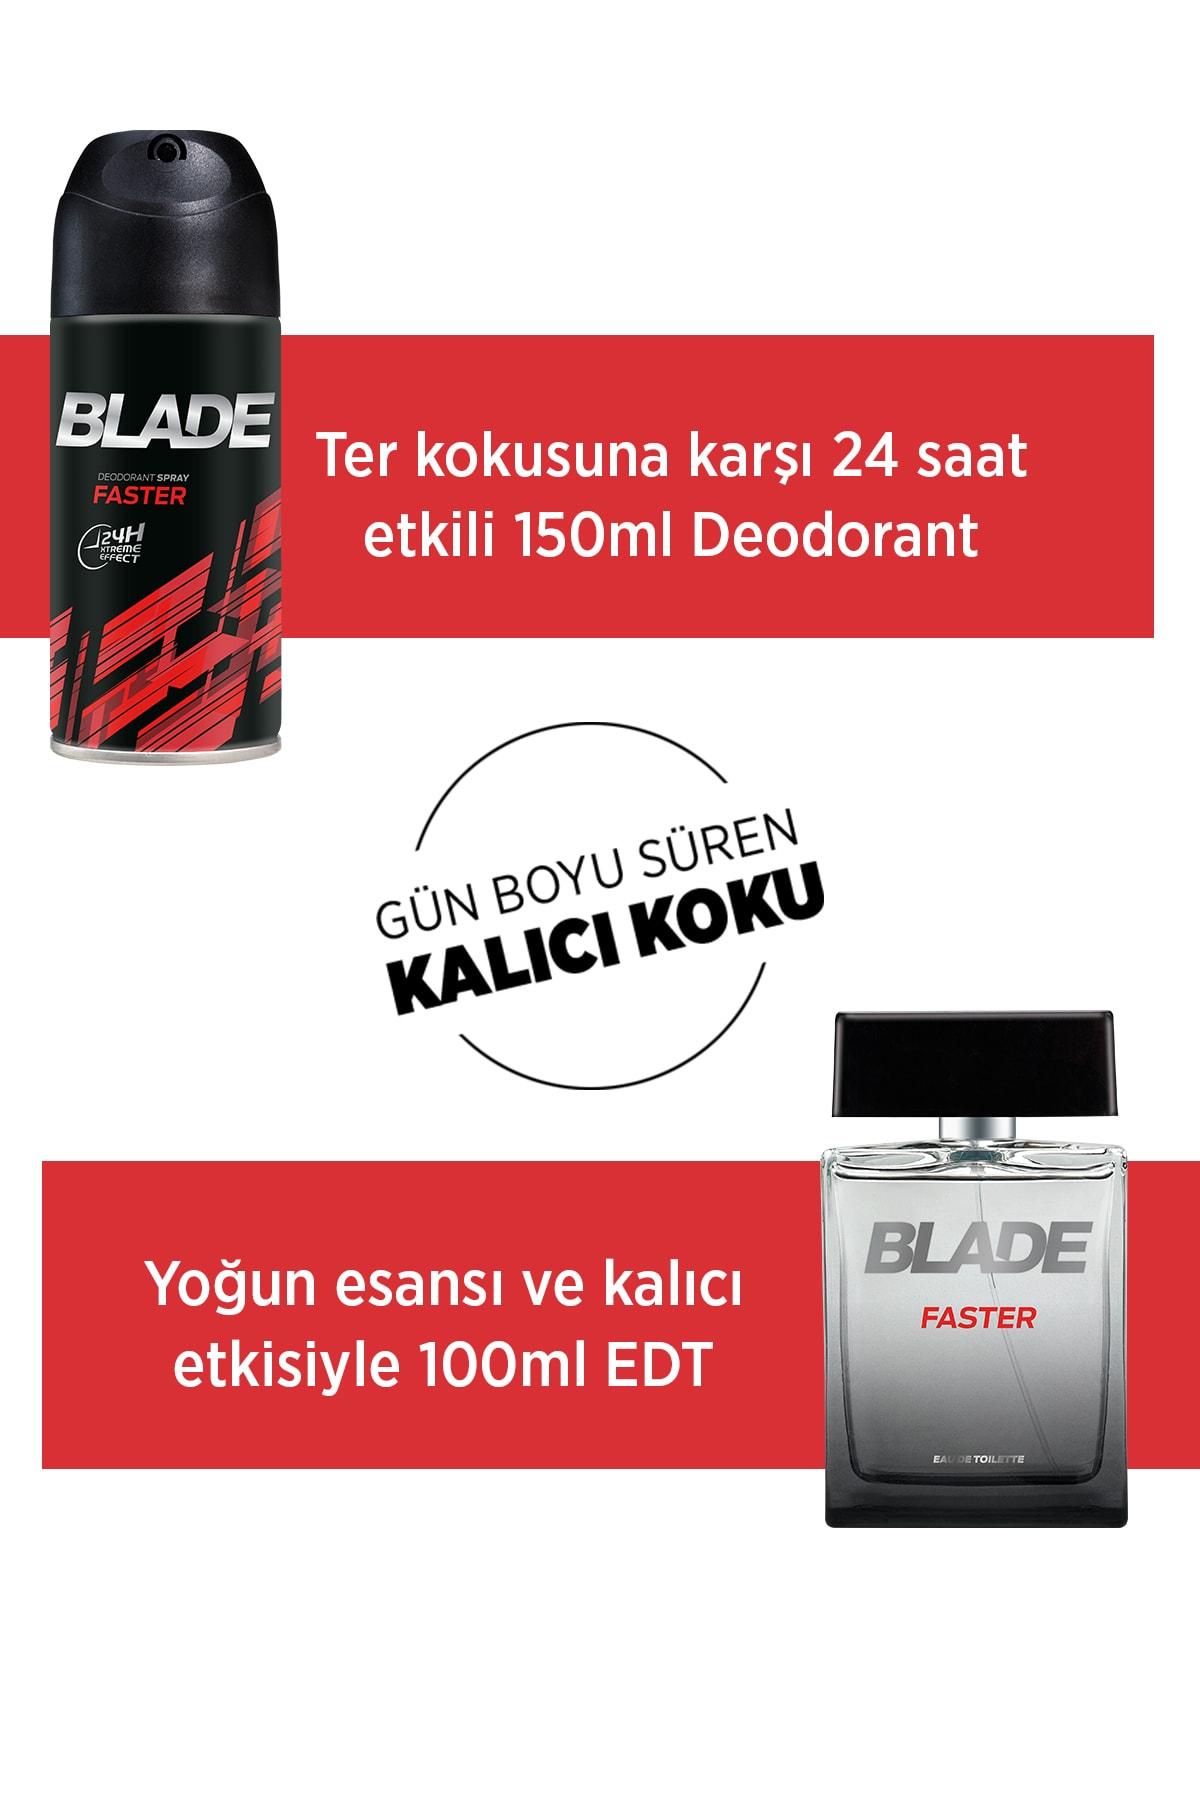 Blade Faster Erkek Deodorant 3x150ml 2